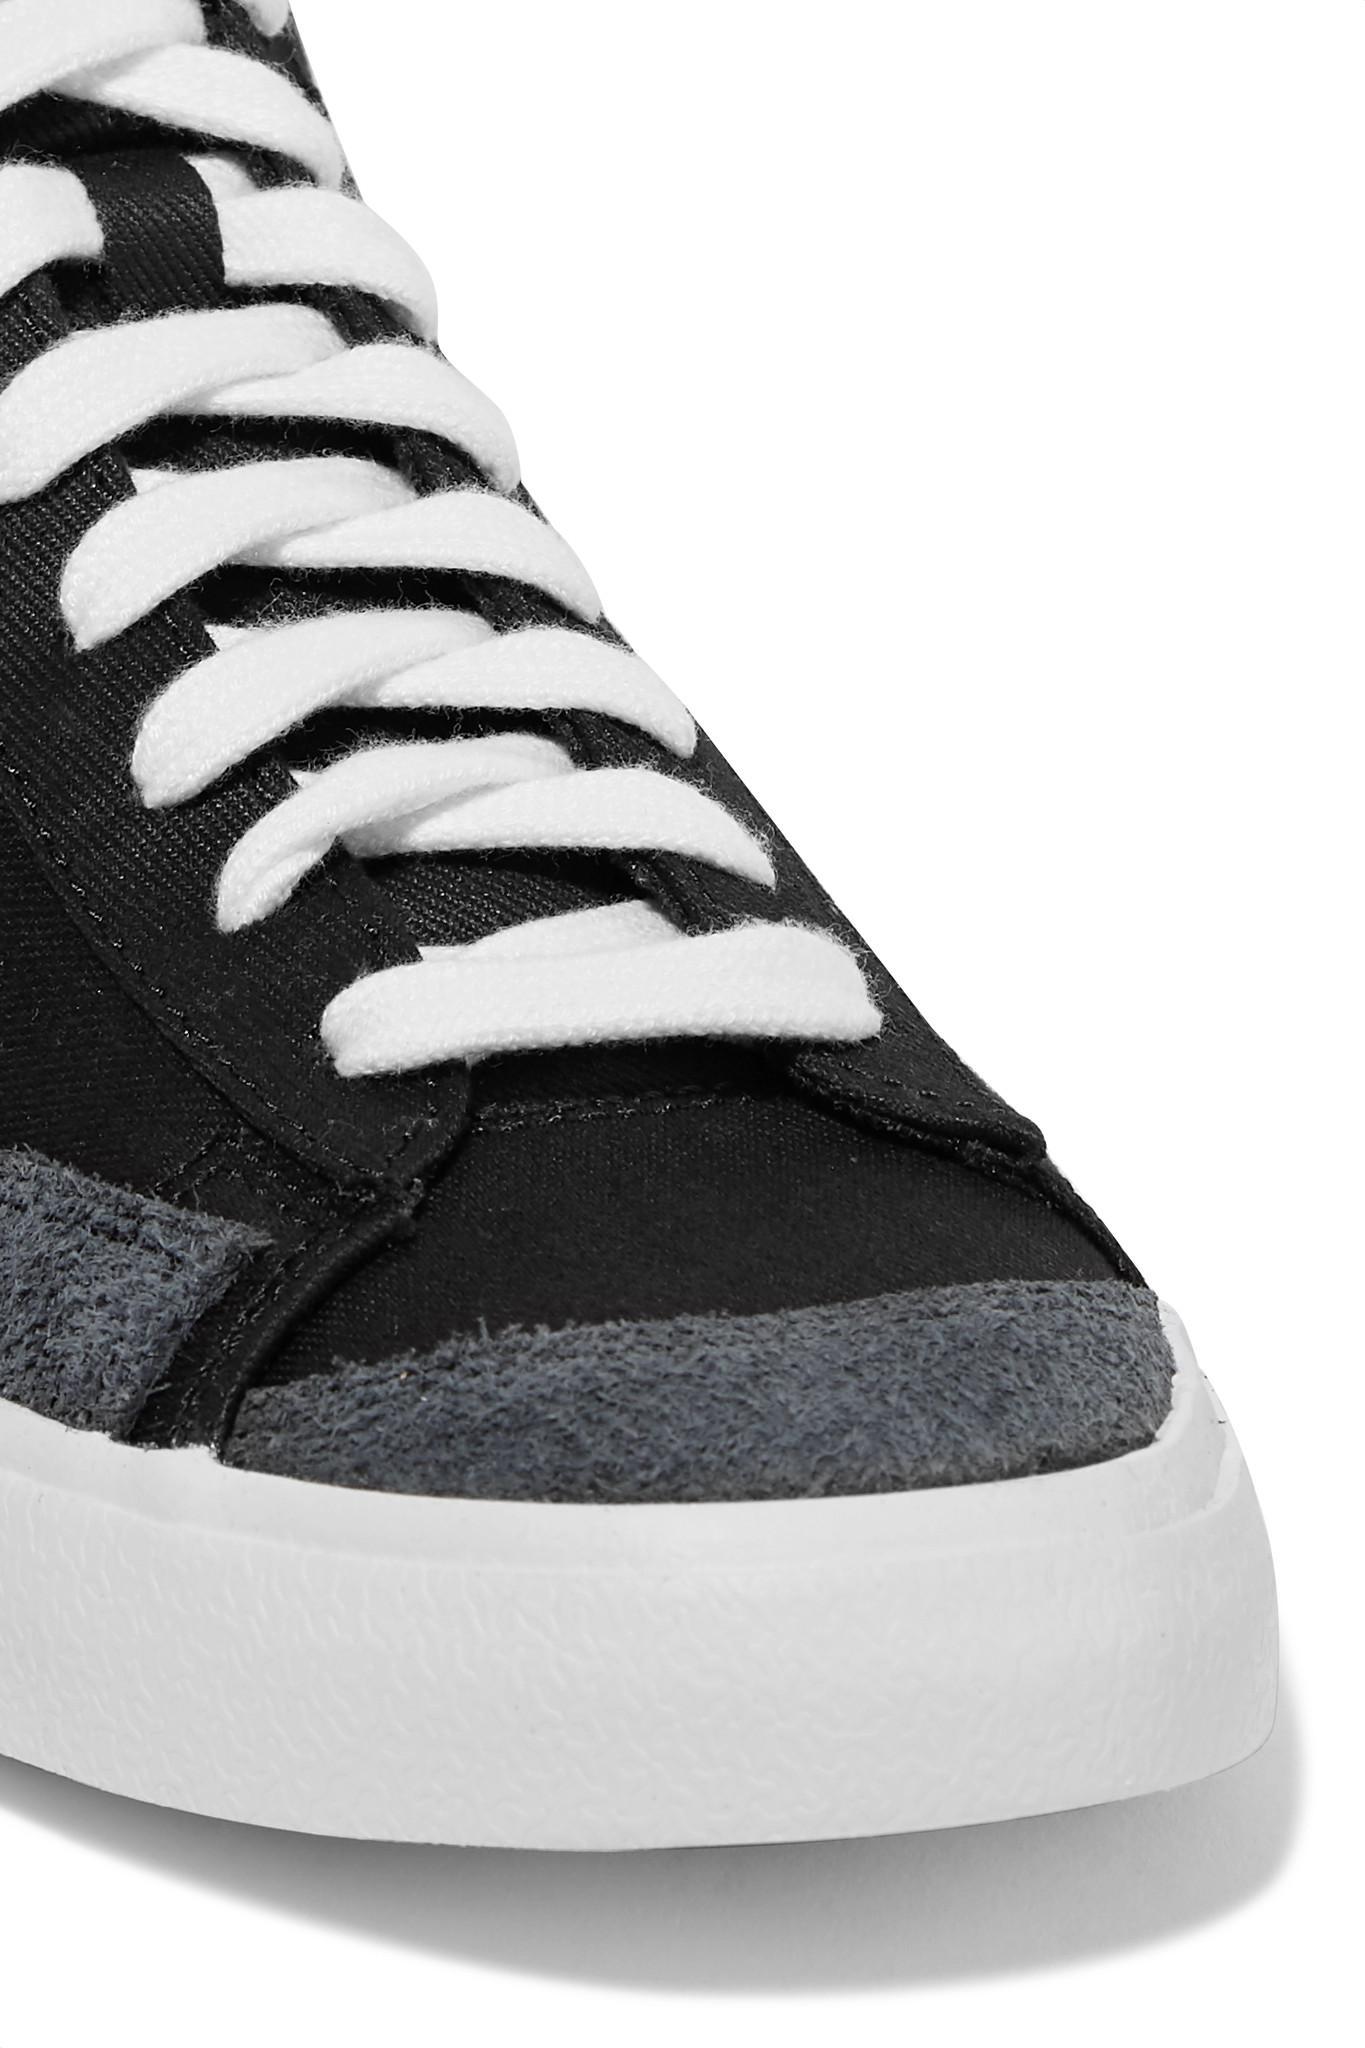 buy online a1daa e24ba Nike - Black Blazer Mid  77 Suede-trimmed Canvas High-top Sneakers -. View  fullscreen